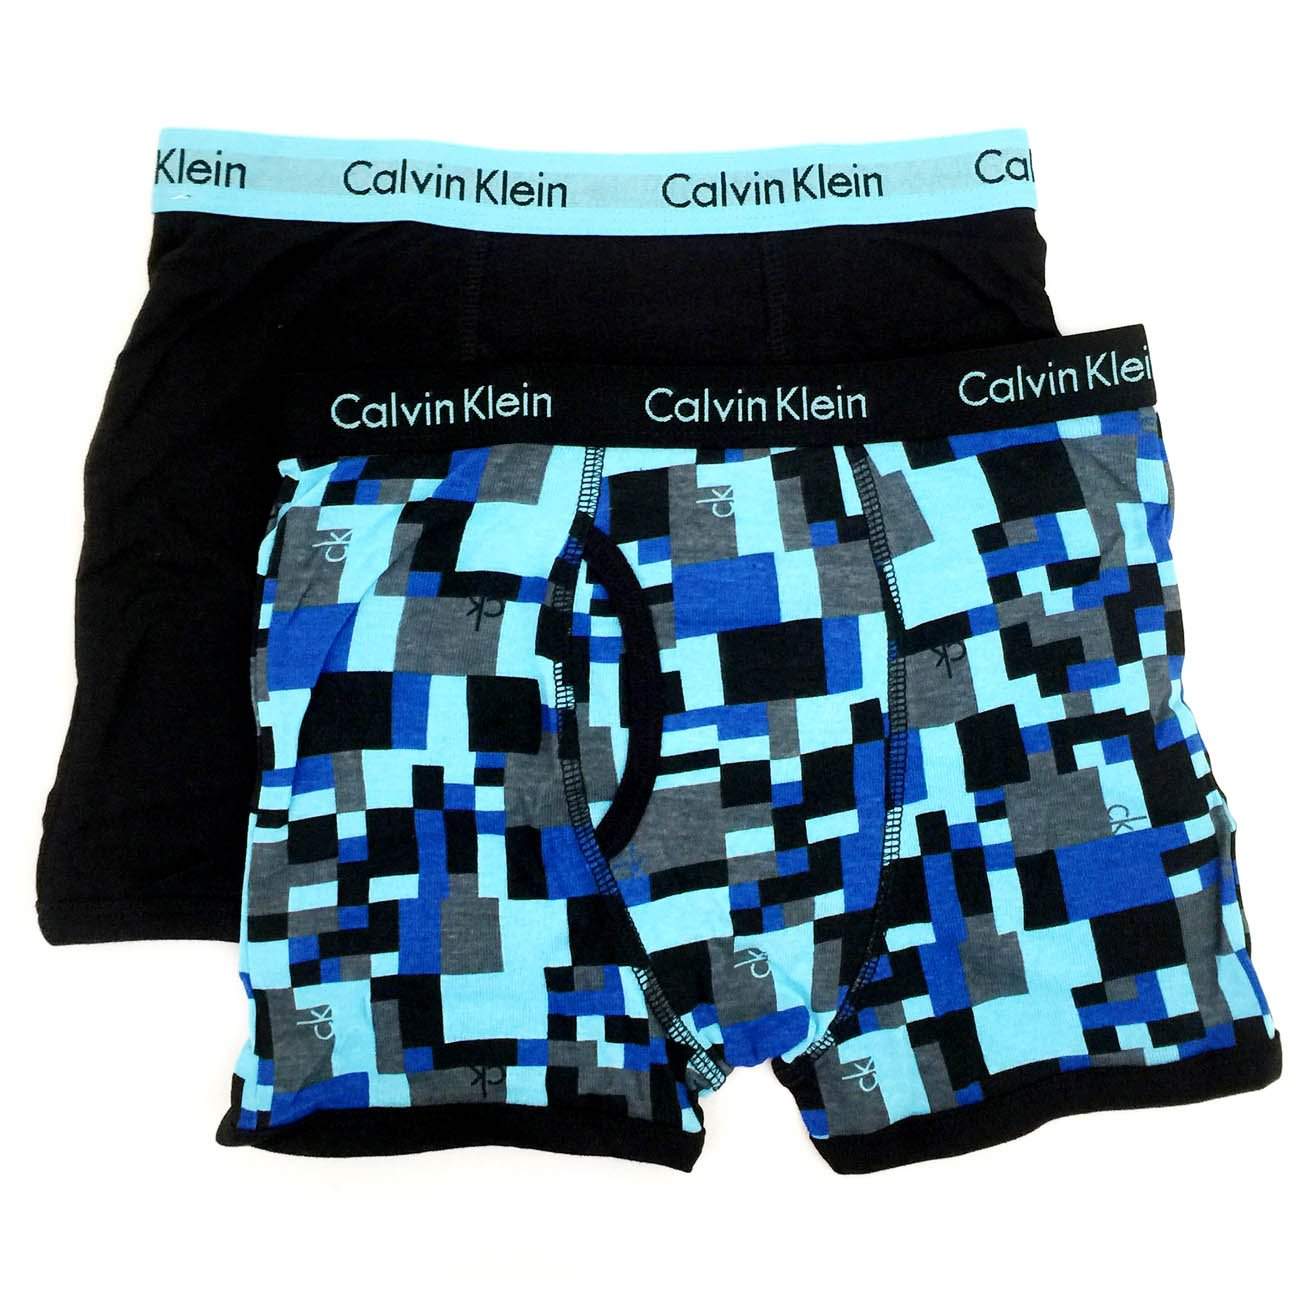 Calvin Klein Little/Big Boys' Assorted Boxer Briefs (Pack of 2) 37D67165